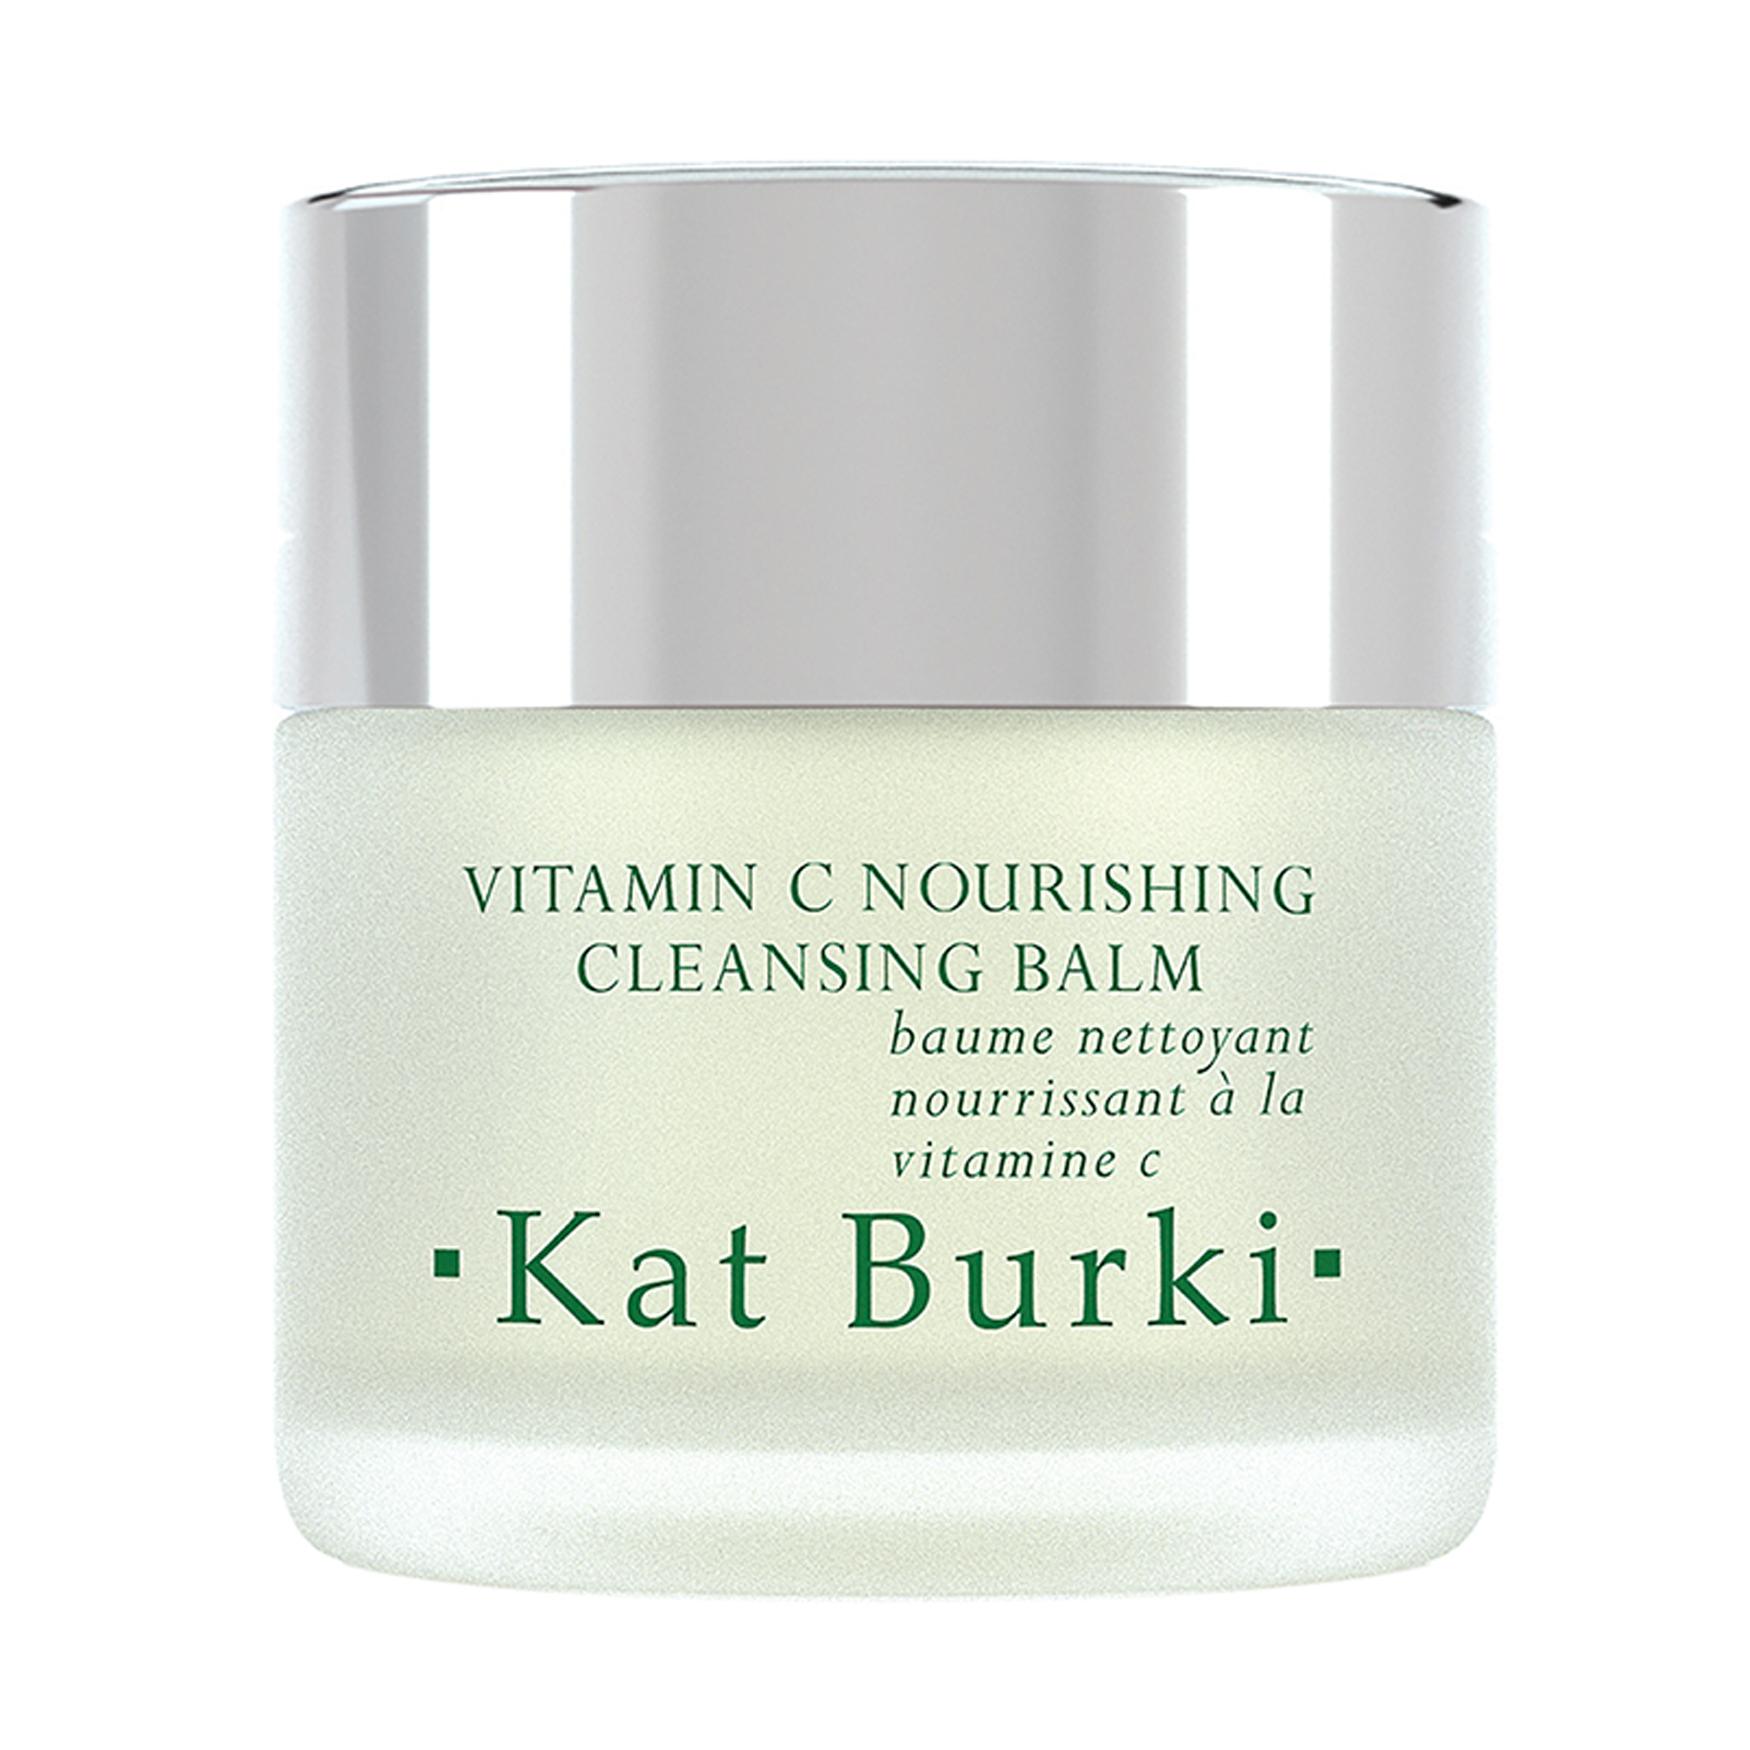 Kat Burki Vitamin C Nourishing Cleansing Balm Spacenk Usd Ovale Gel Aloe Vera